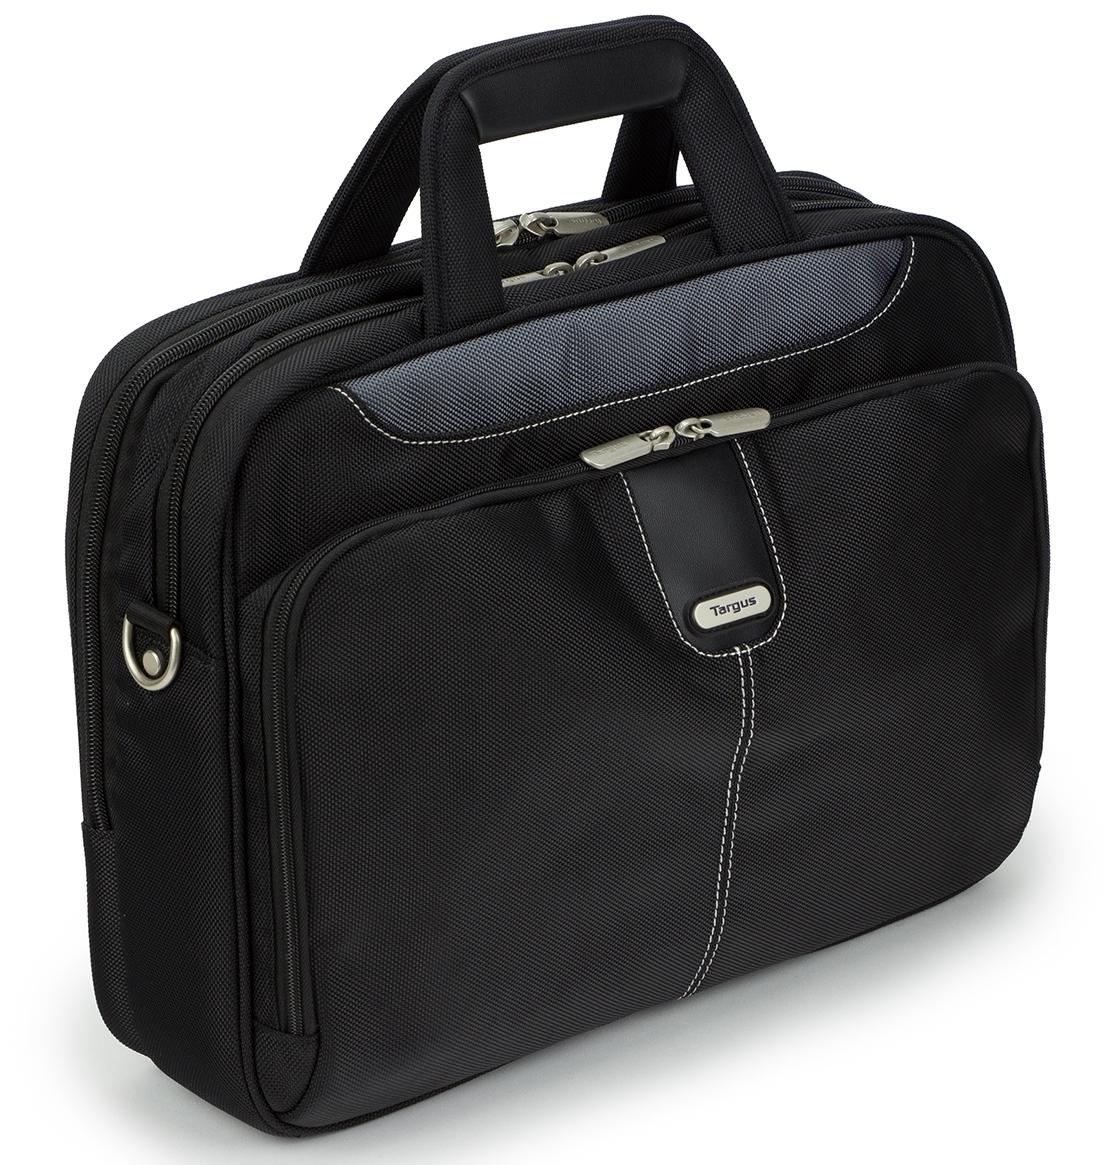 Сумка Targus Transit Topload для ноутбука 15,6 дюймов  цена